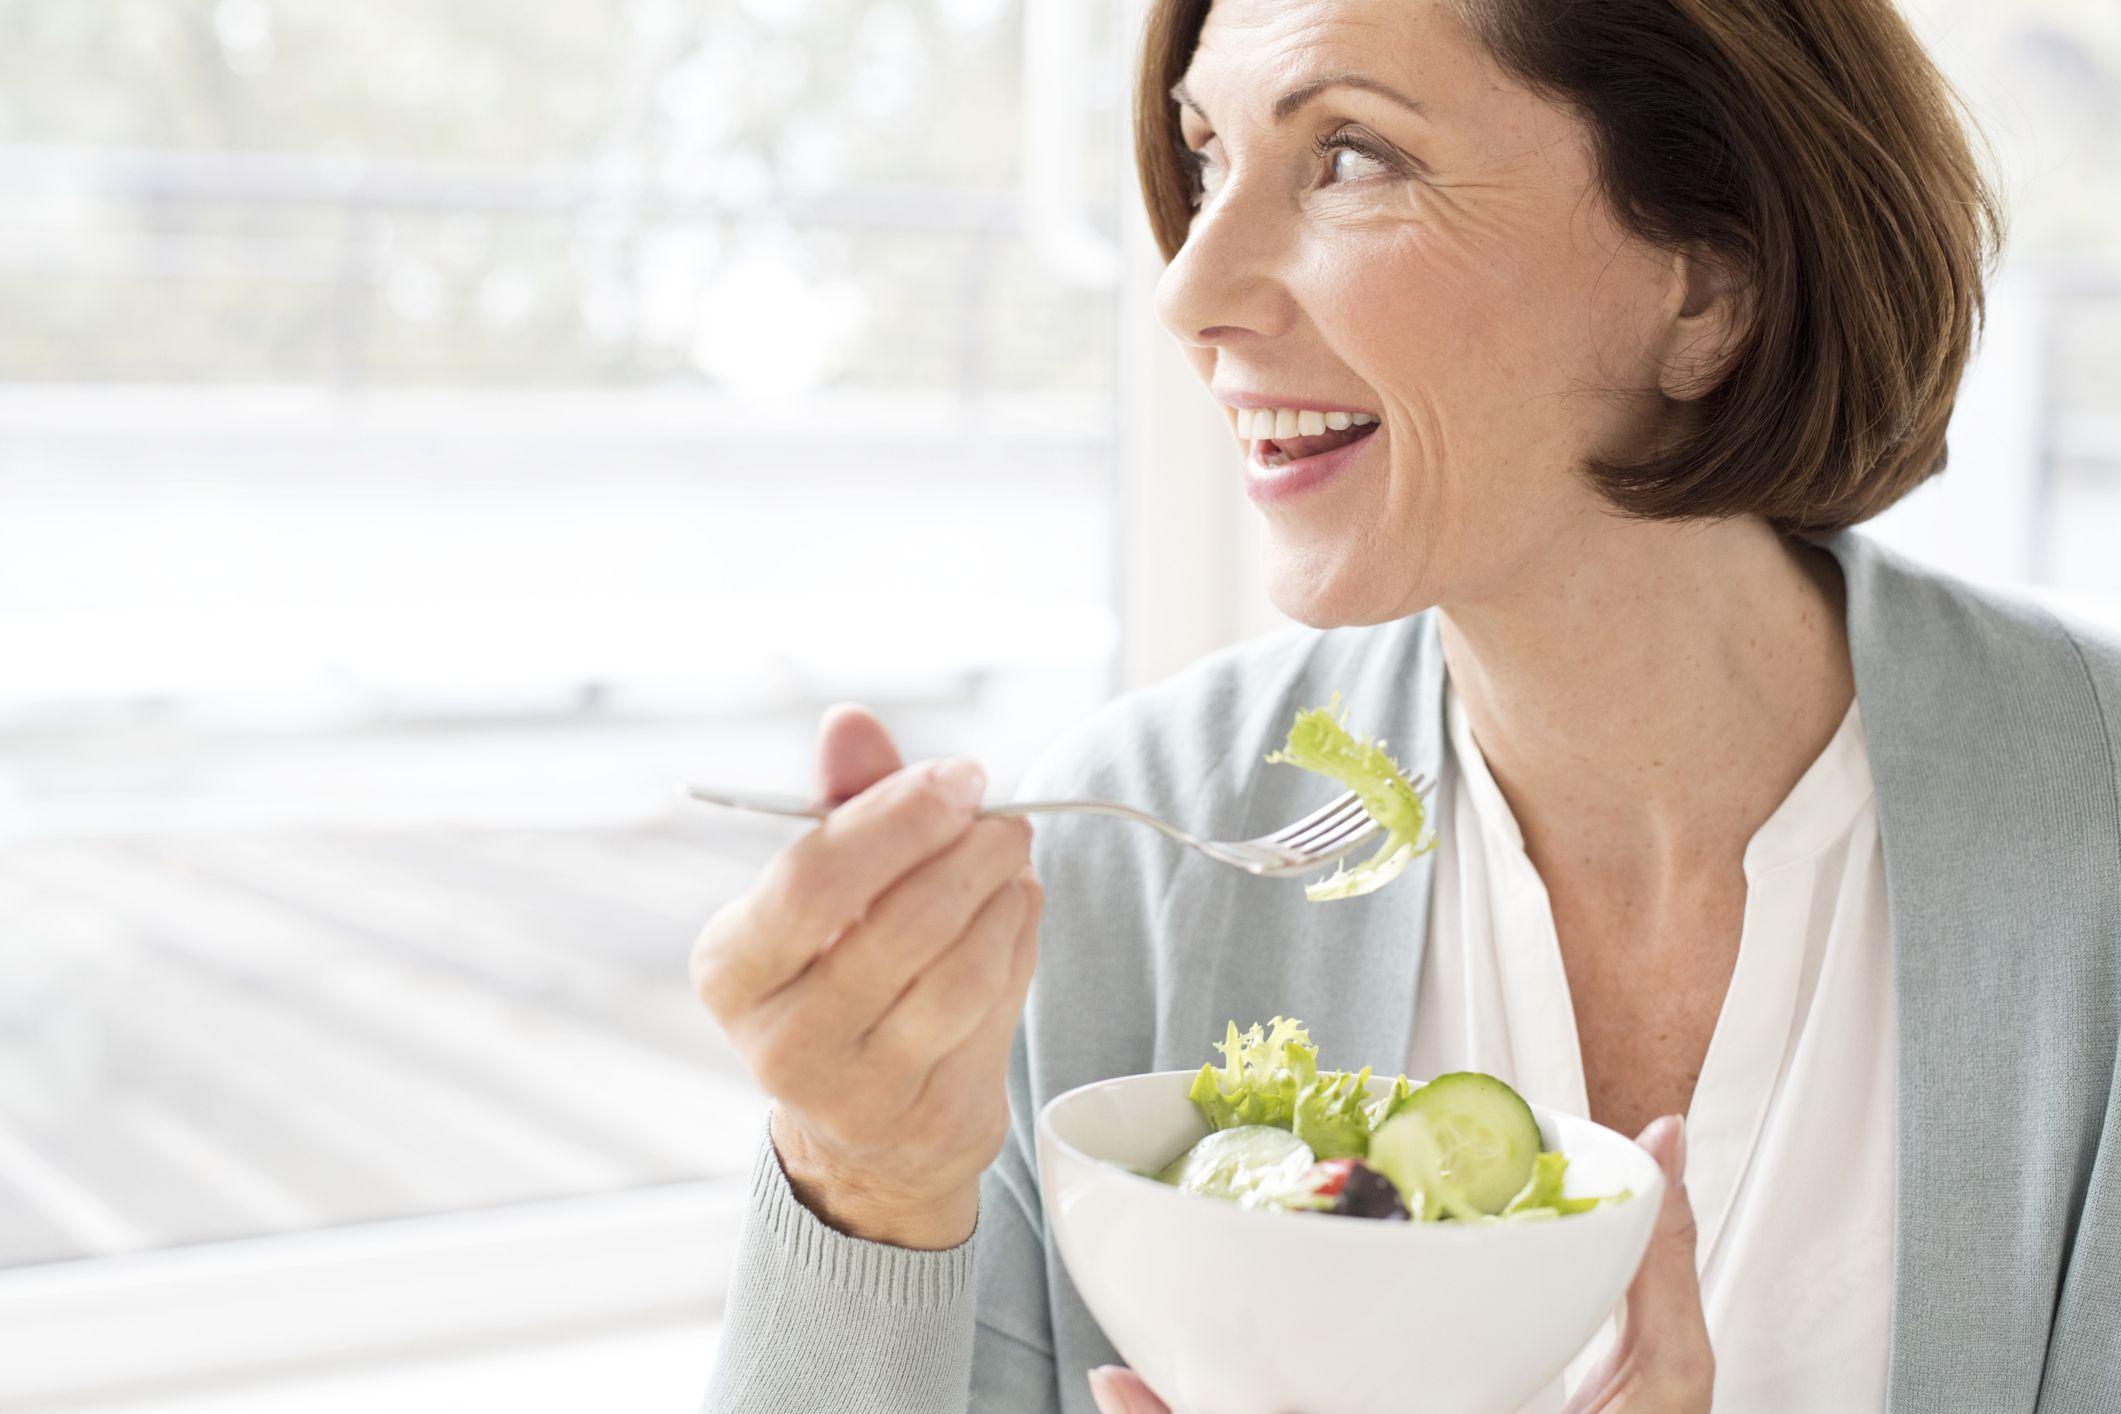 hopw many grams of sugar on ckd diet